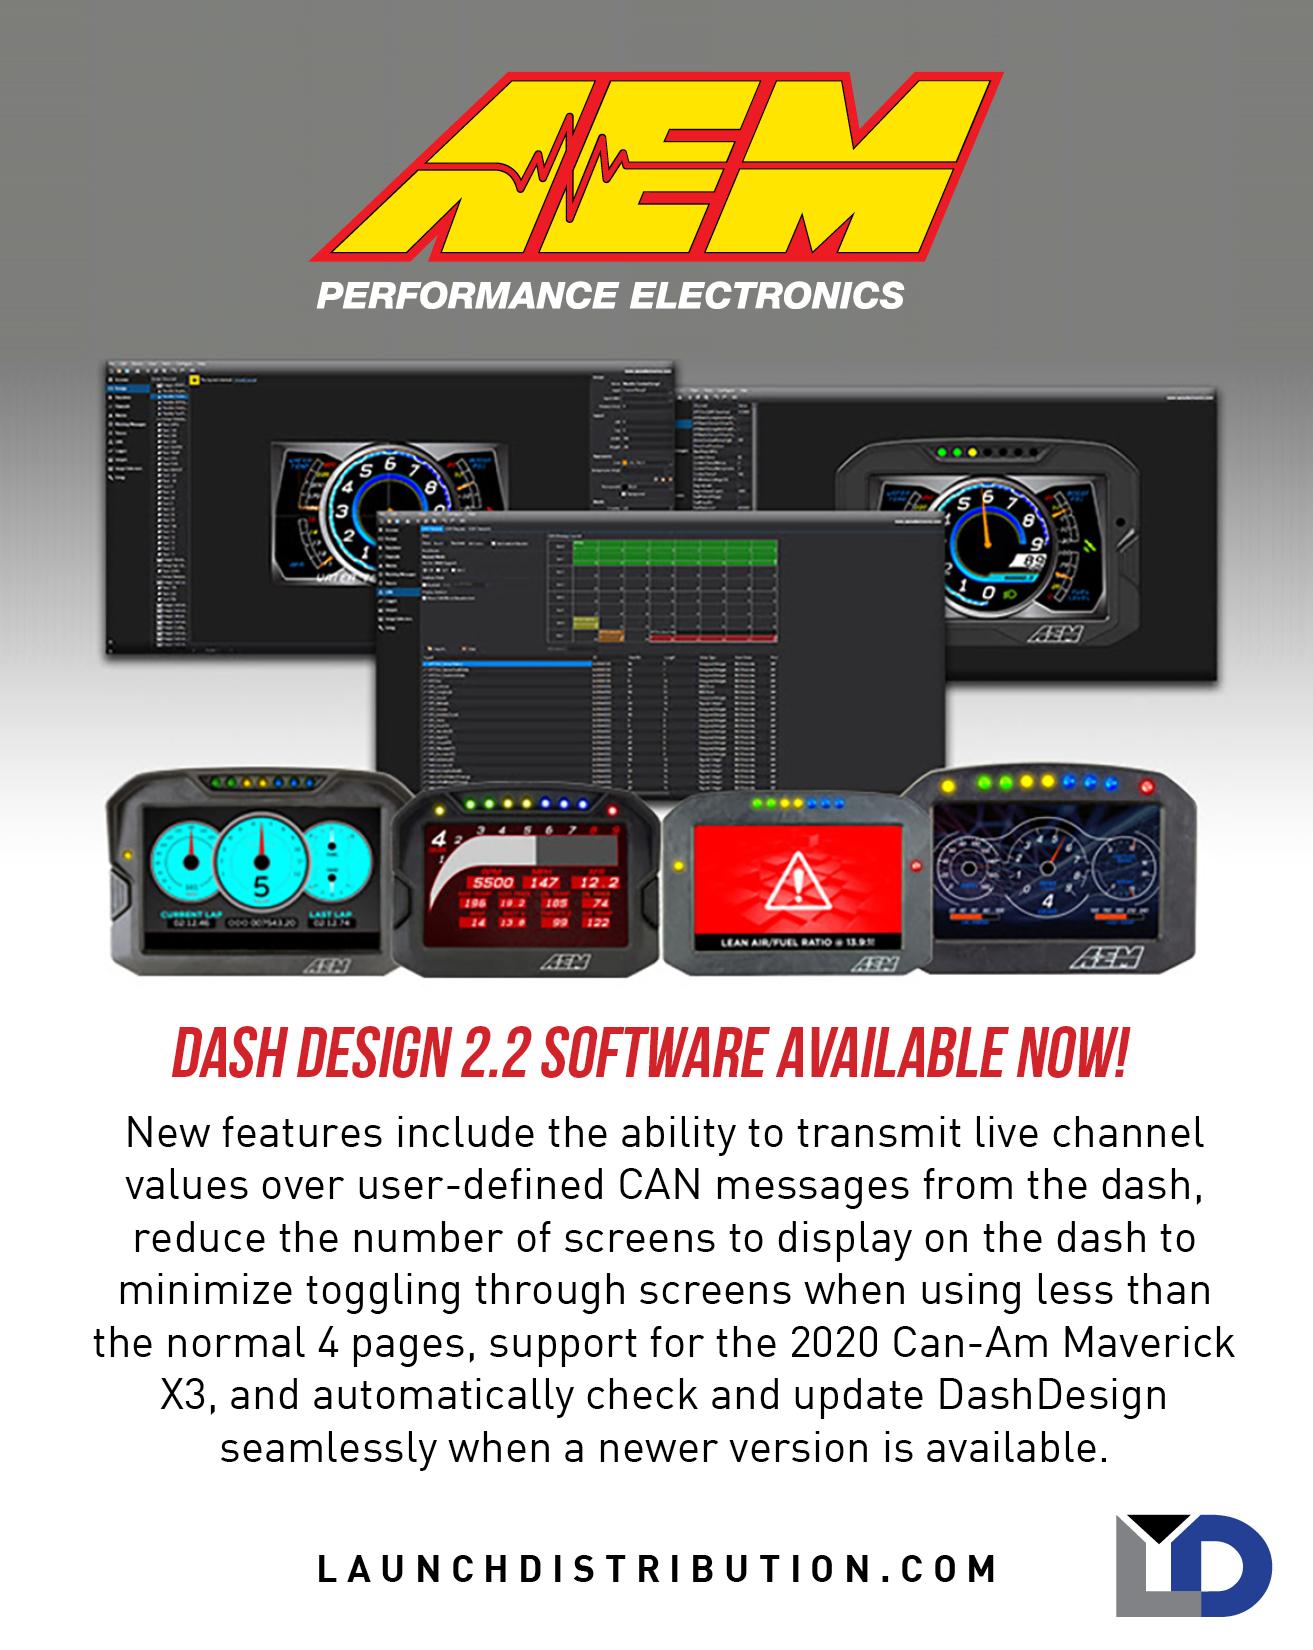 AEM Electronics Dash Design 2.2 Software Now Available